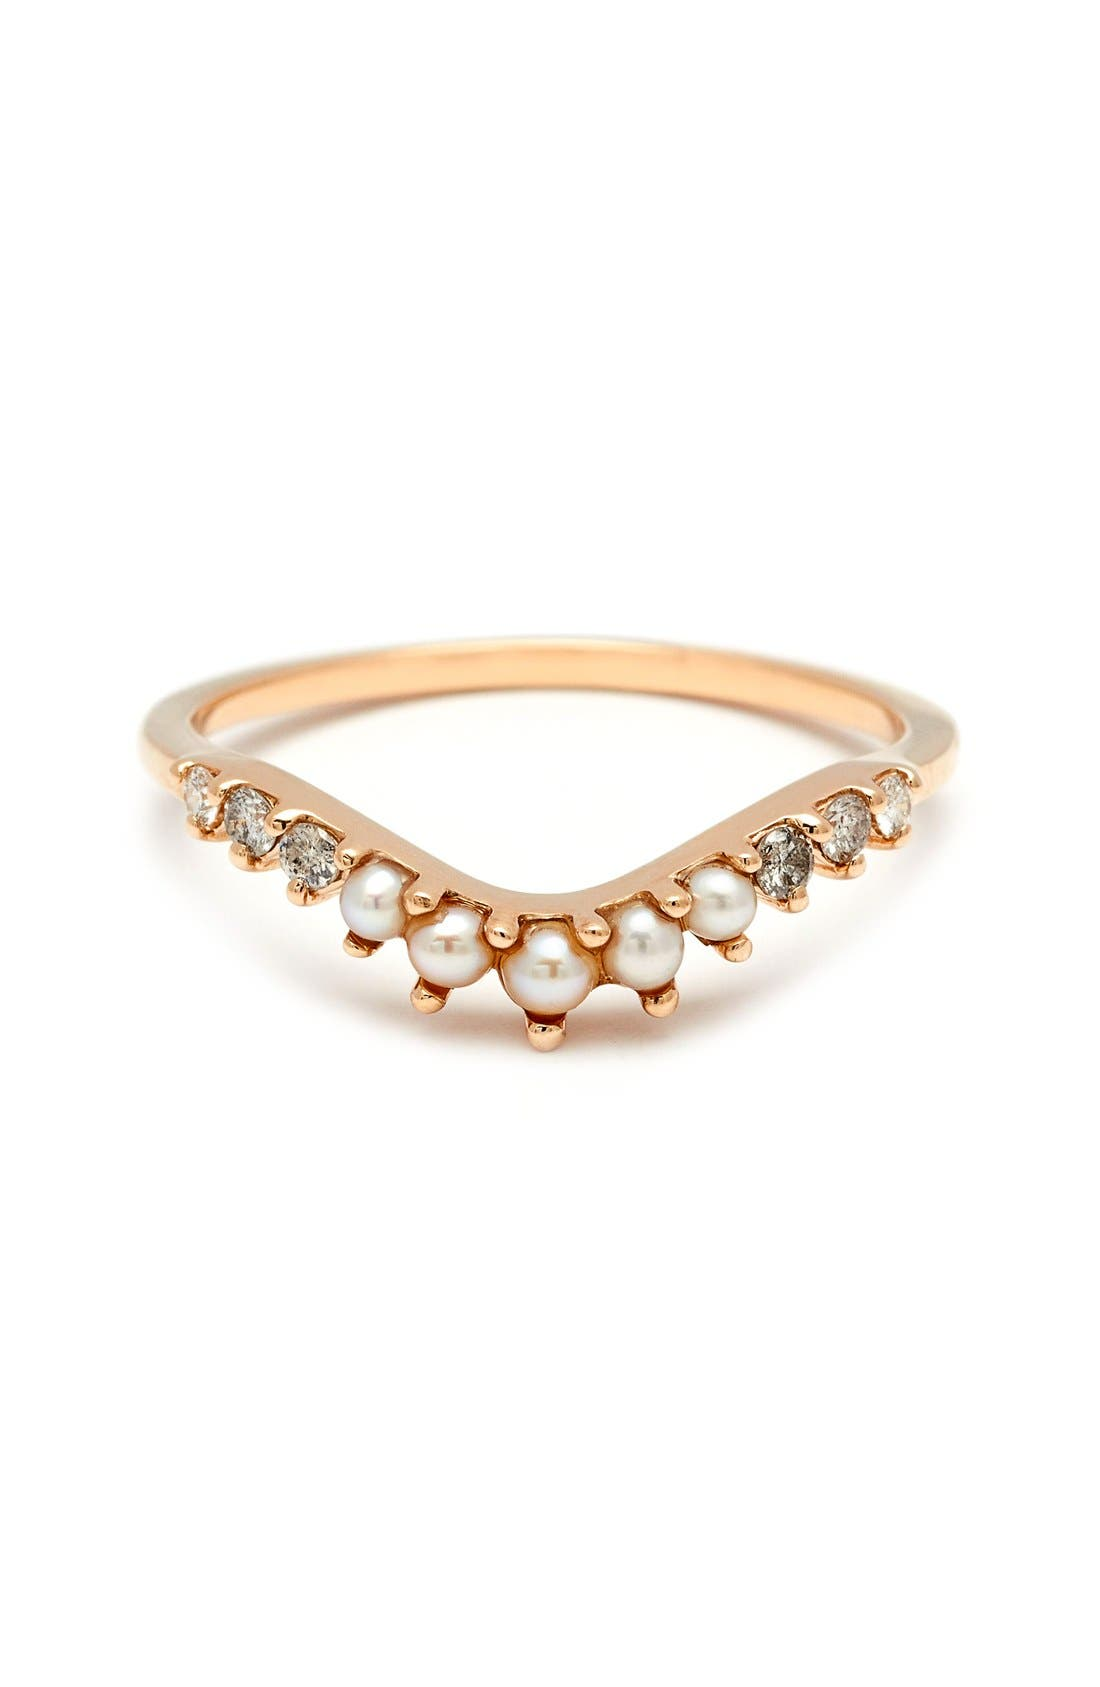 Main Image - Anna Sheffield 'Tiara Curve' Diamond & Seed Pearl Ring